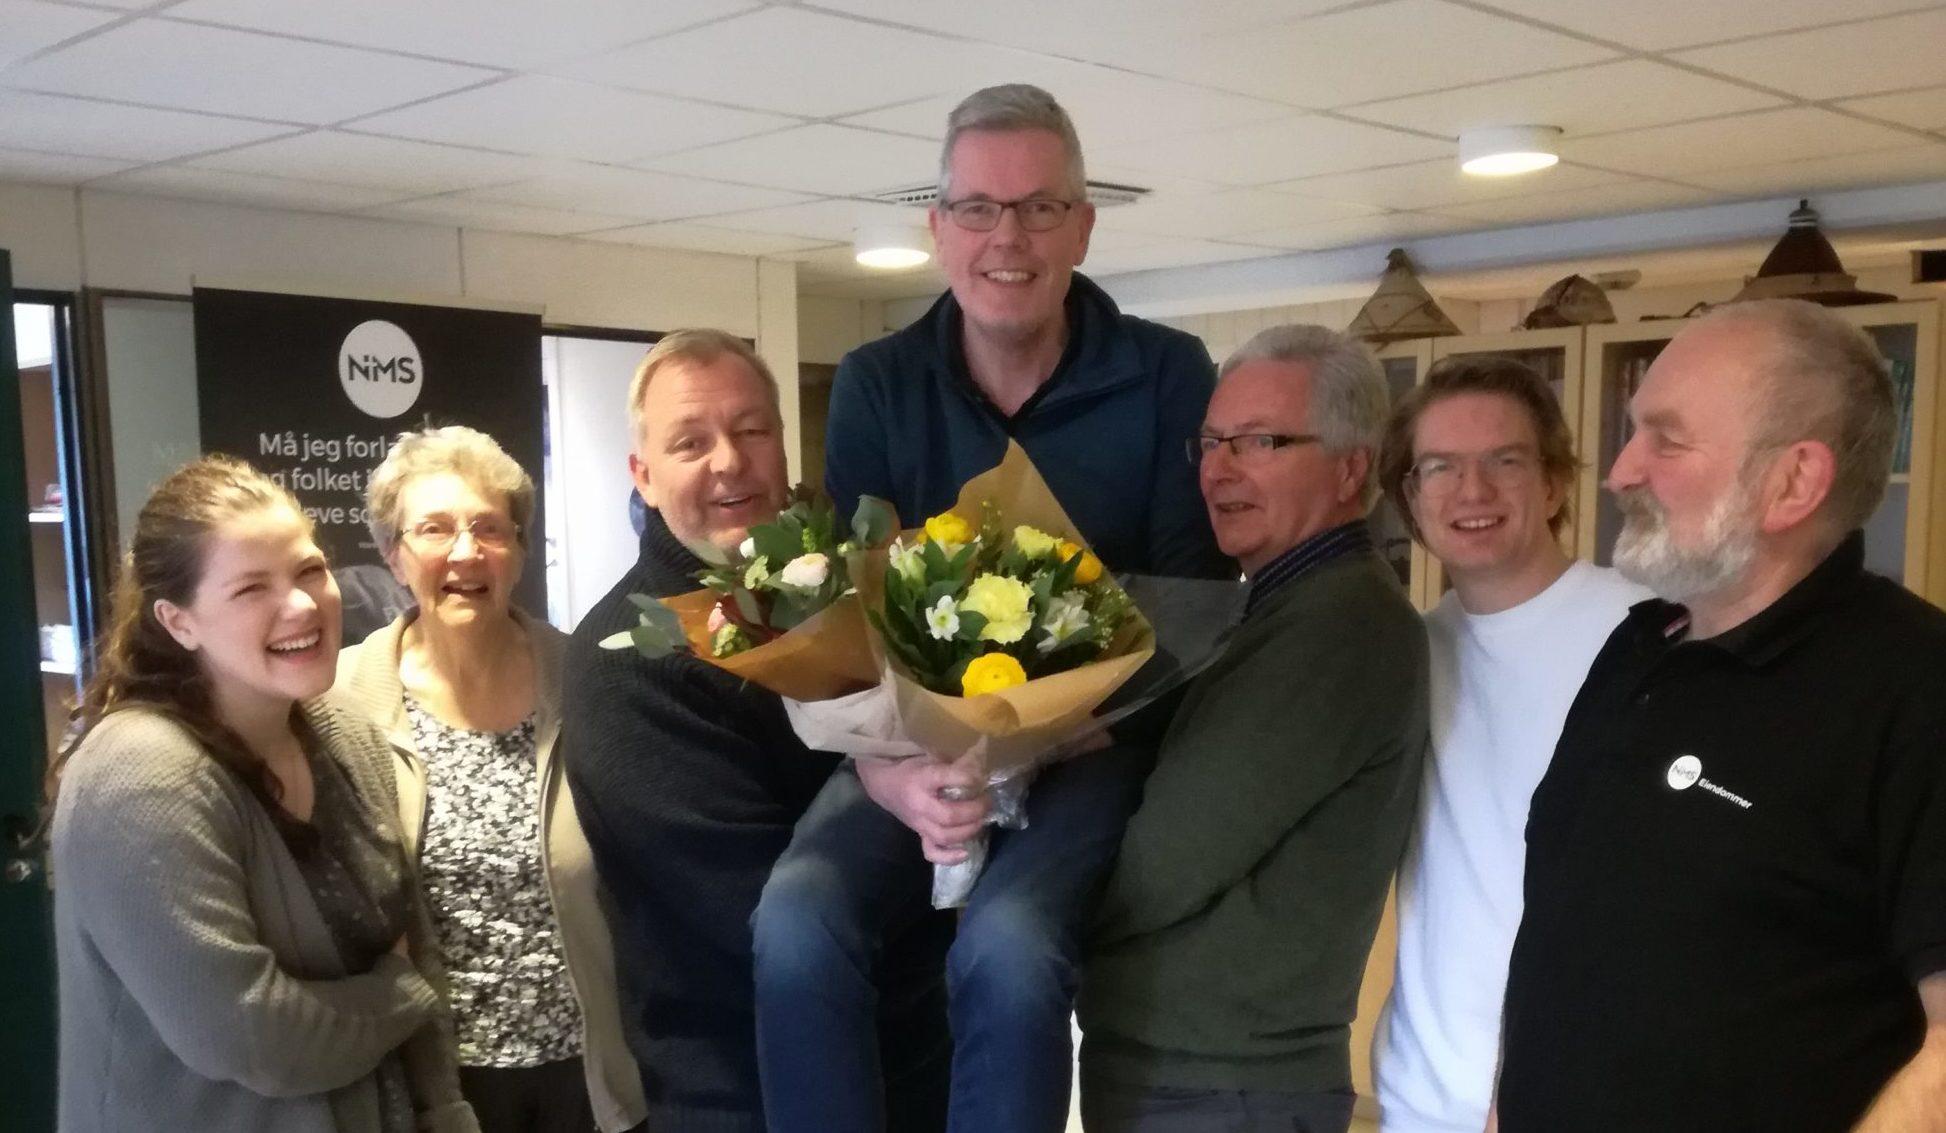 Takk til Gunnar! F.v Margrete Piscoya Hodne, Inger Johanne Christoffersen, Øyvind Ulland Eriksen, Gunnar Eskelund, Birger Foseide, Emil Buxrud og Ola Syrstadeng.